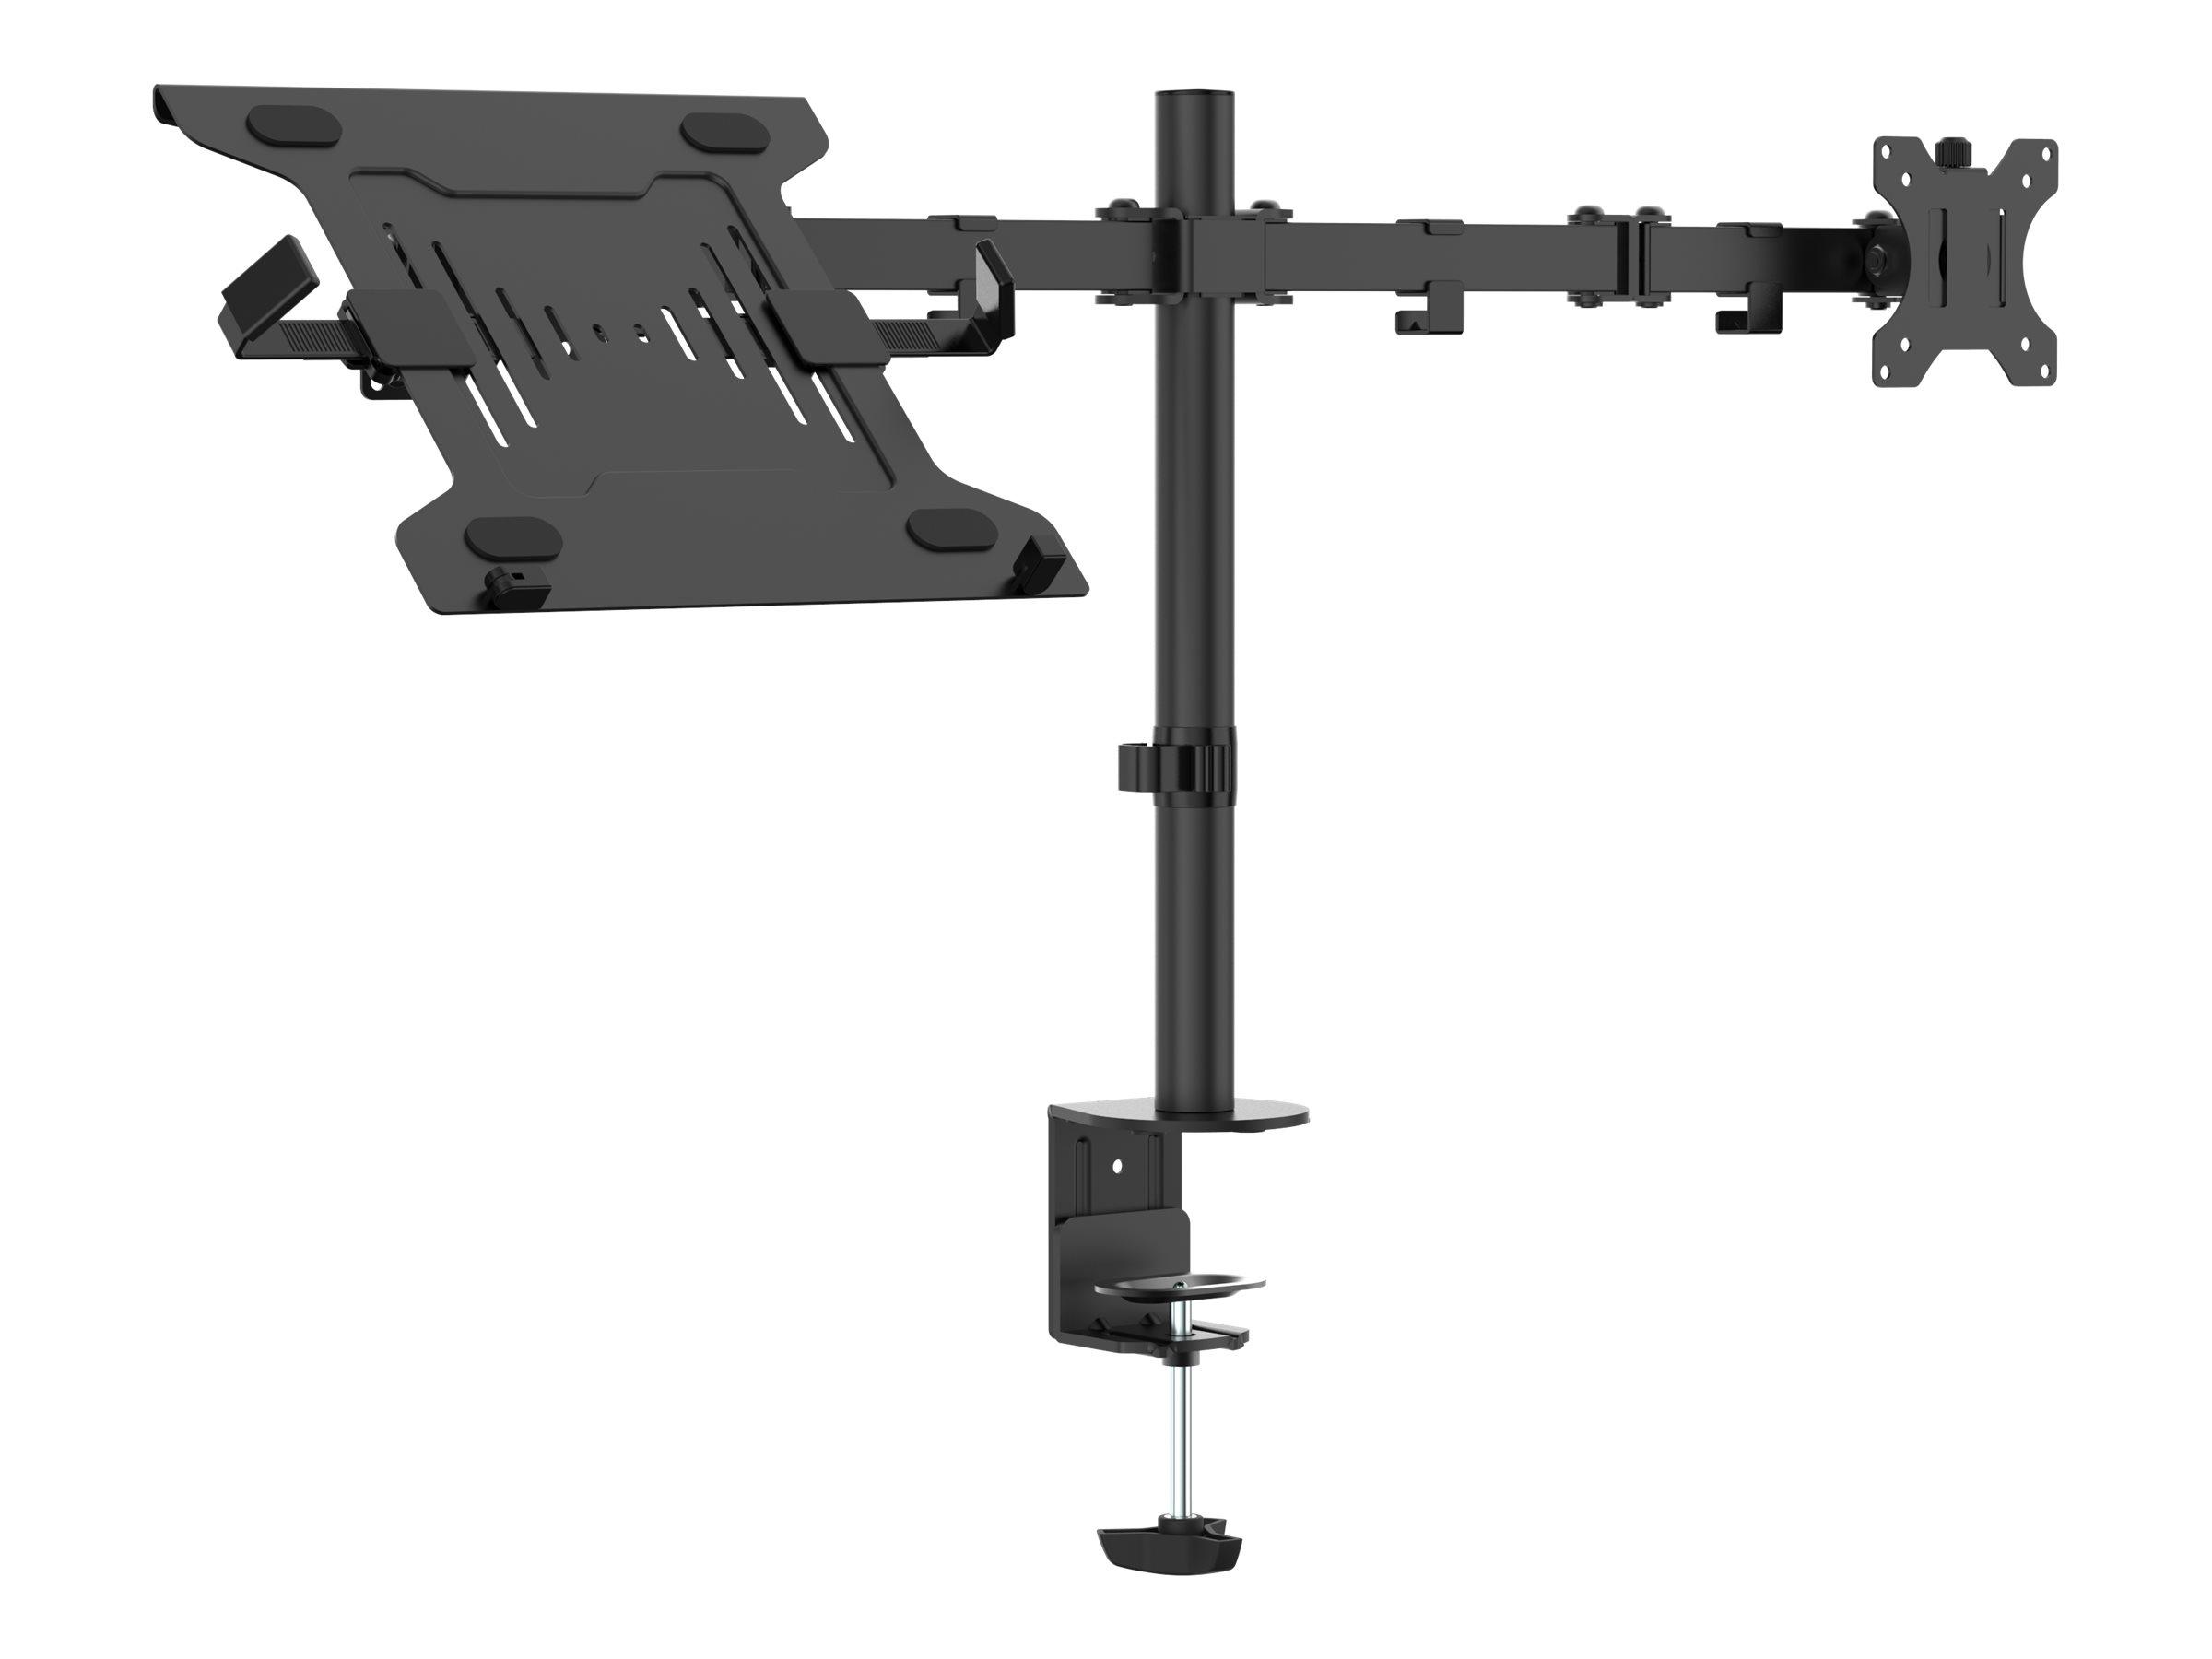 Vision VFM-DPD2B+S - Befestigungskit (Laptop-Ablage, 2 Gelenkarme, Grommetbasis, 2 VESA-Adapter, 17,4